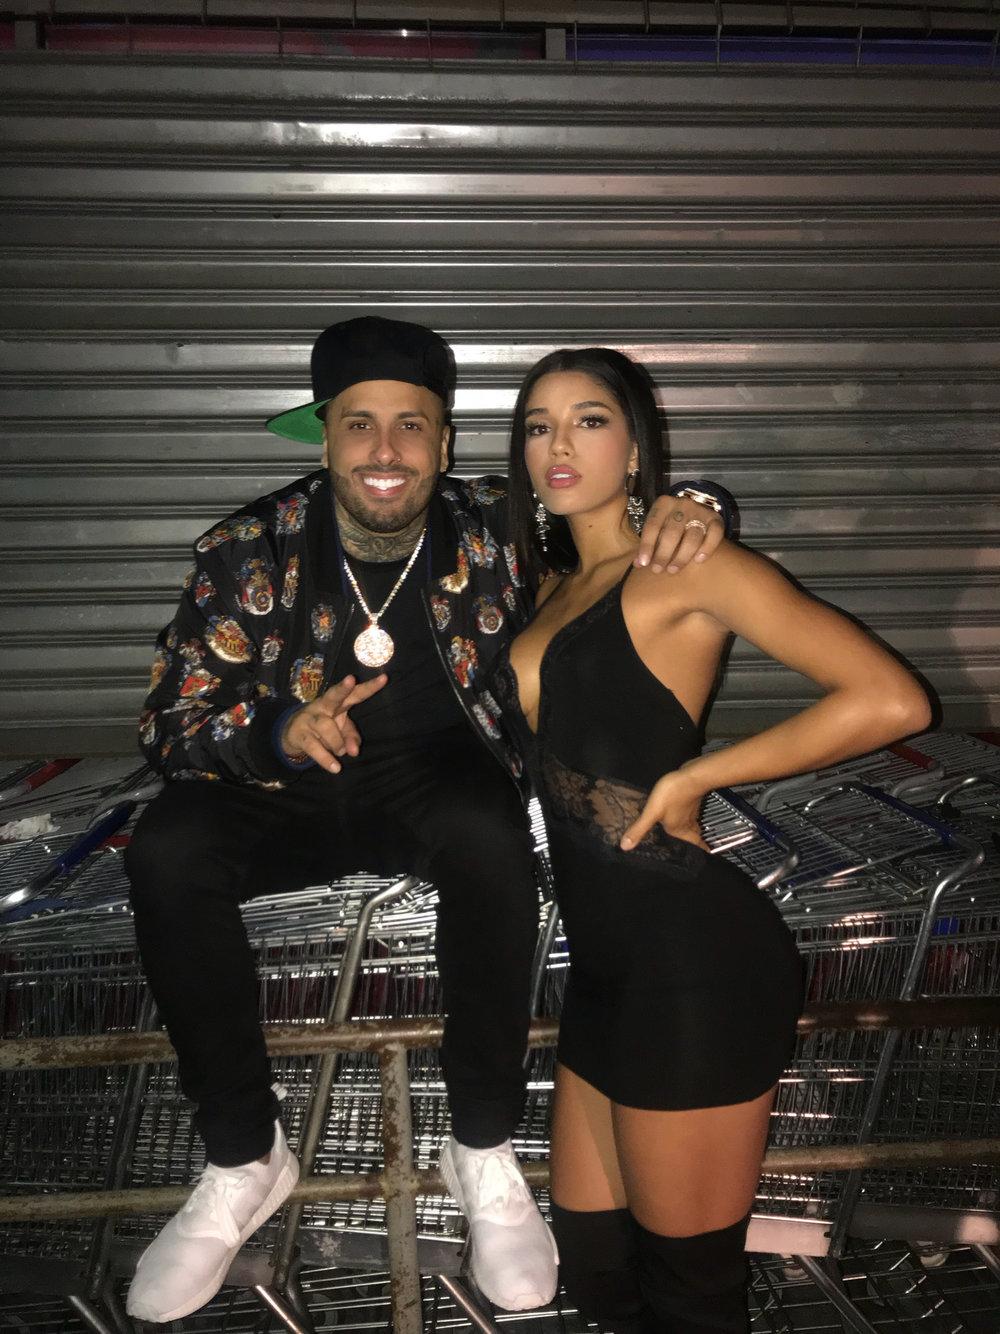 Yovanna Ventura and Nicky Jam on set of Bella y Sensual music video shot in New York City